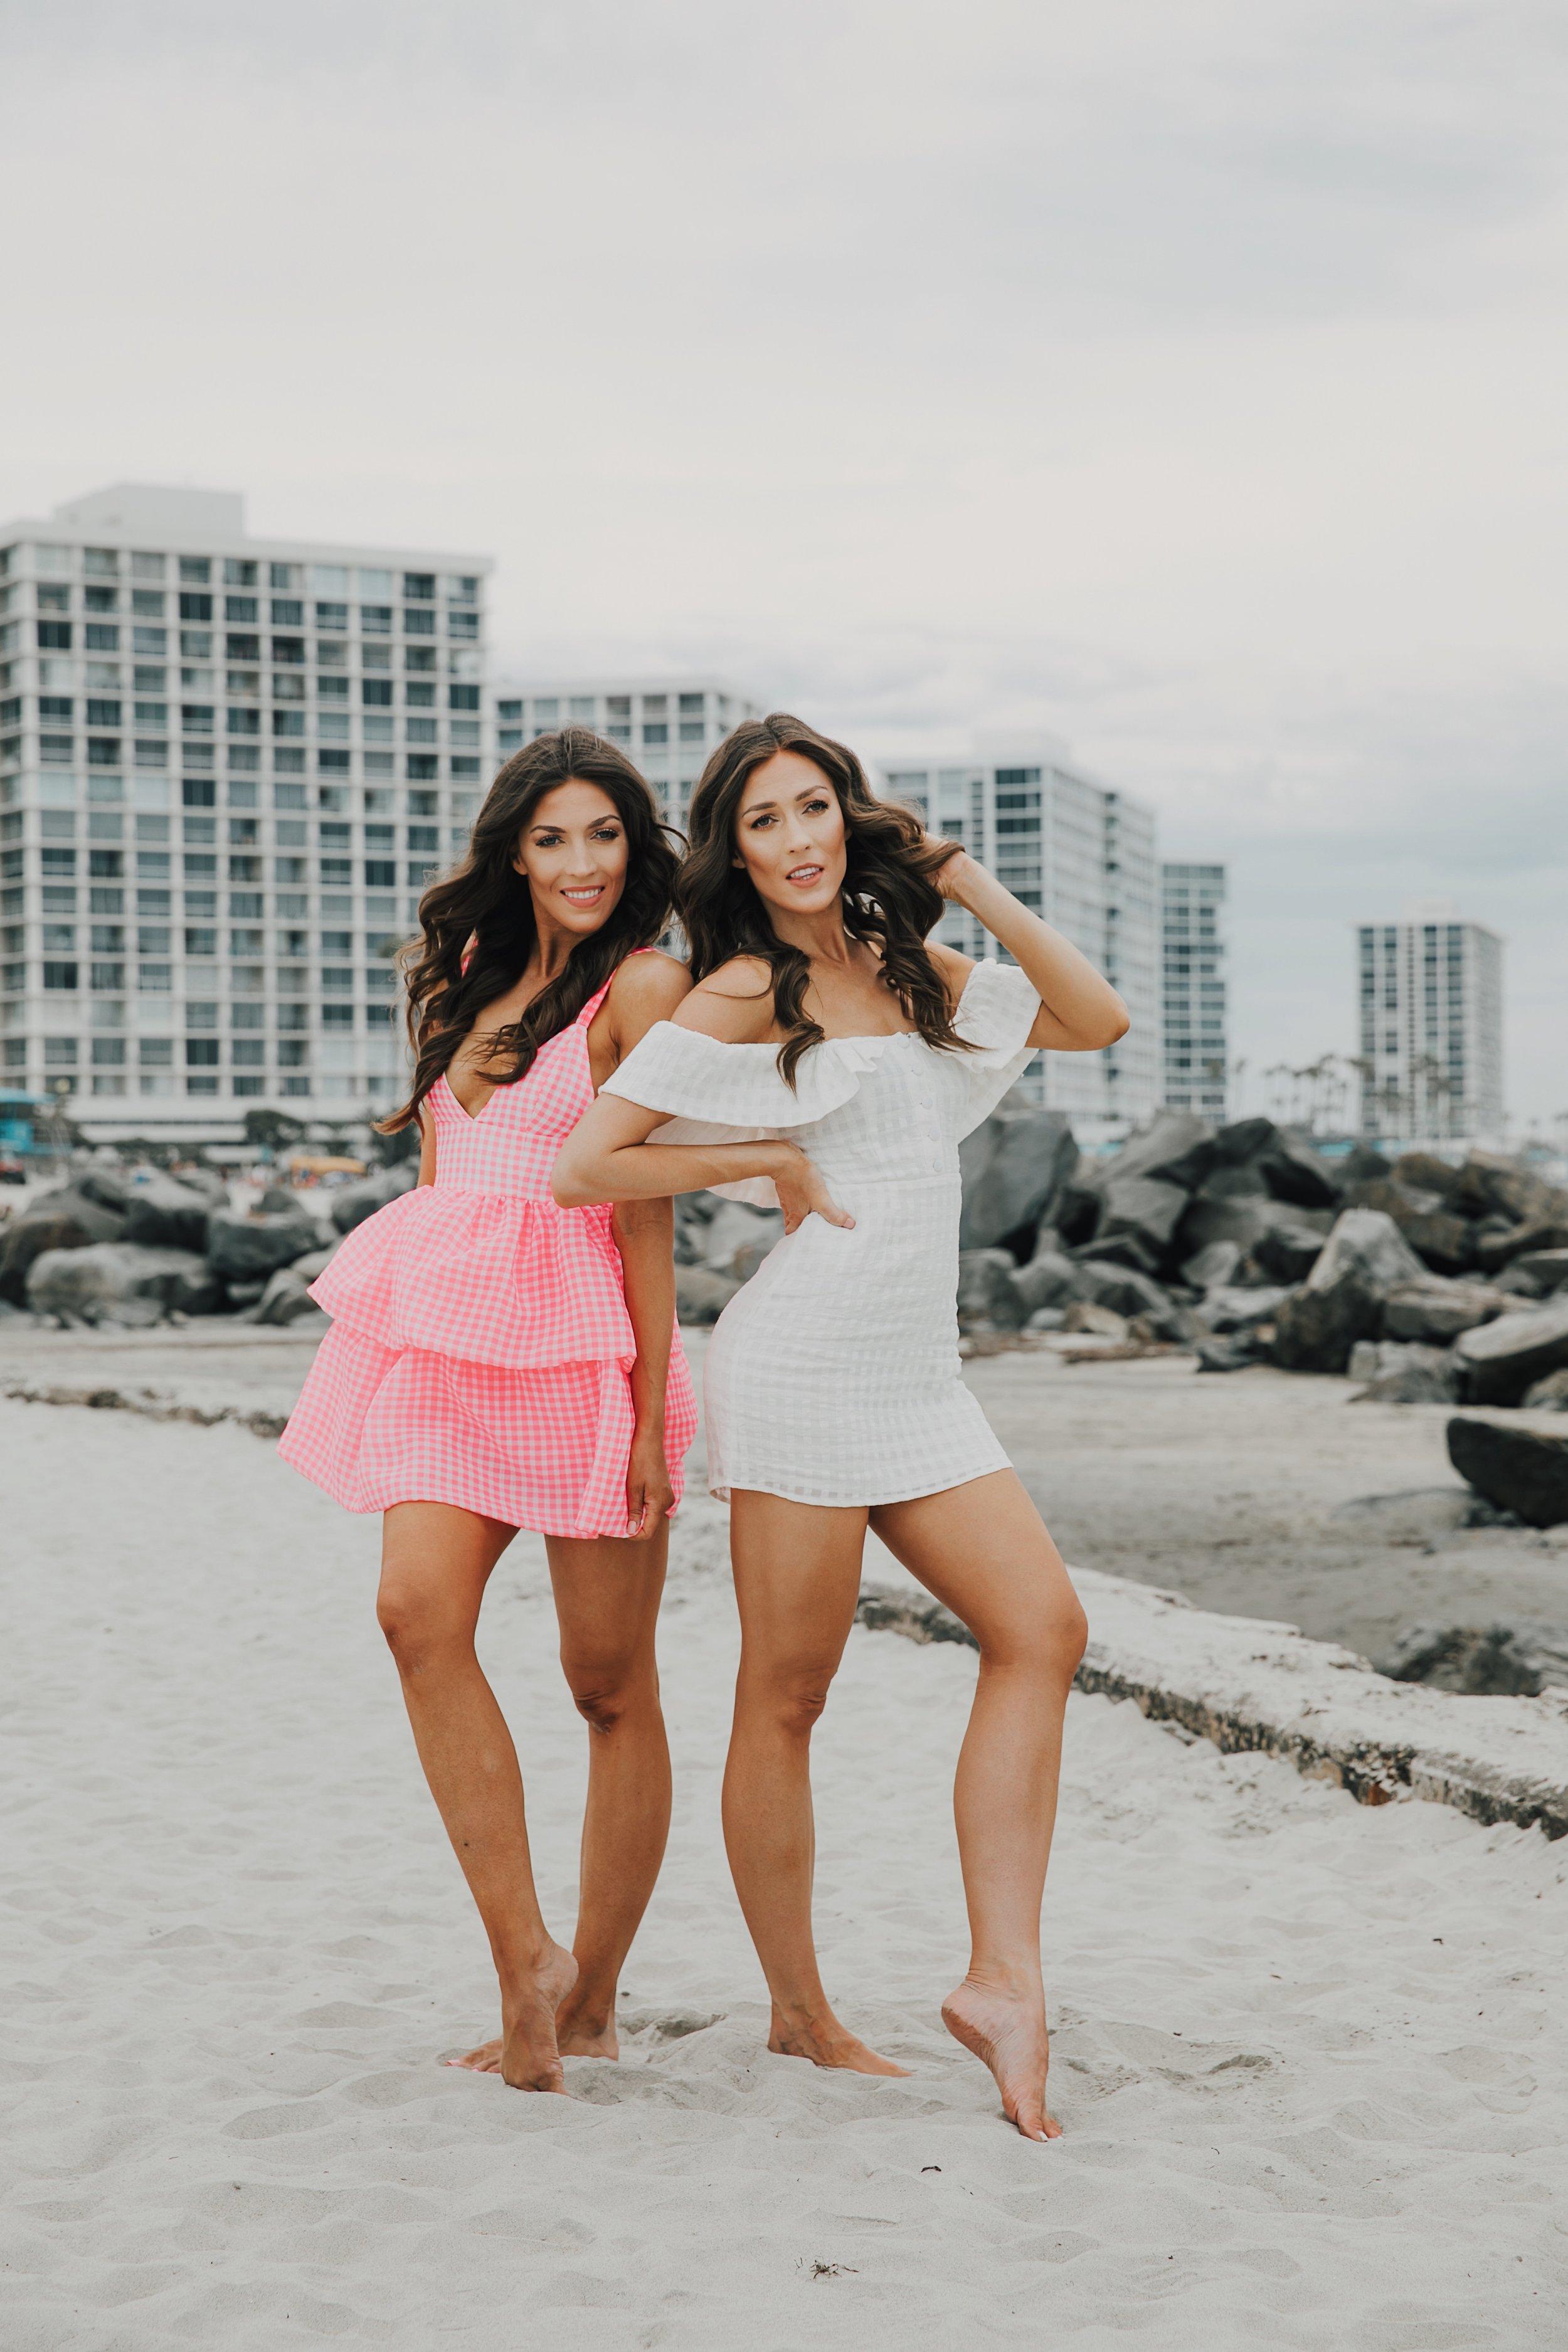 Revolve Gingham Summer Dresses at The Del Coronado 2.JPG